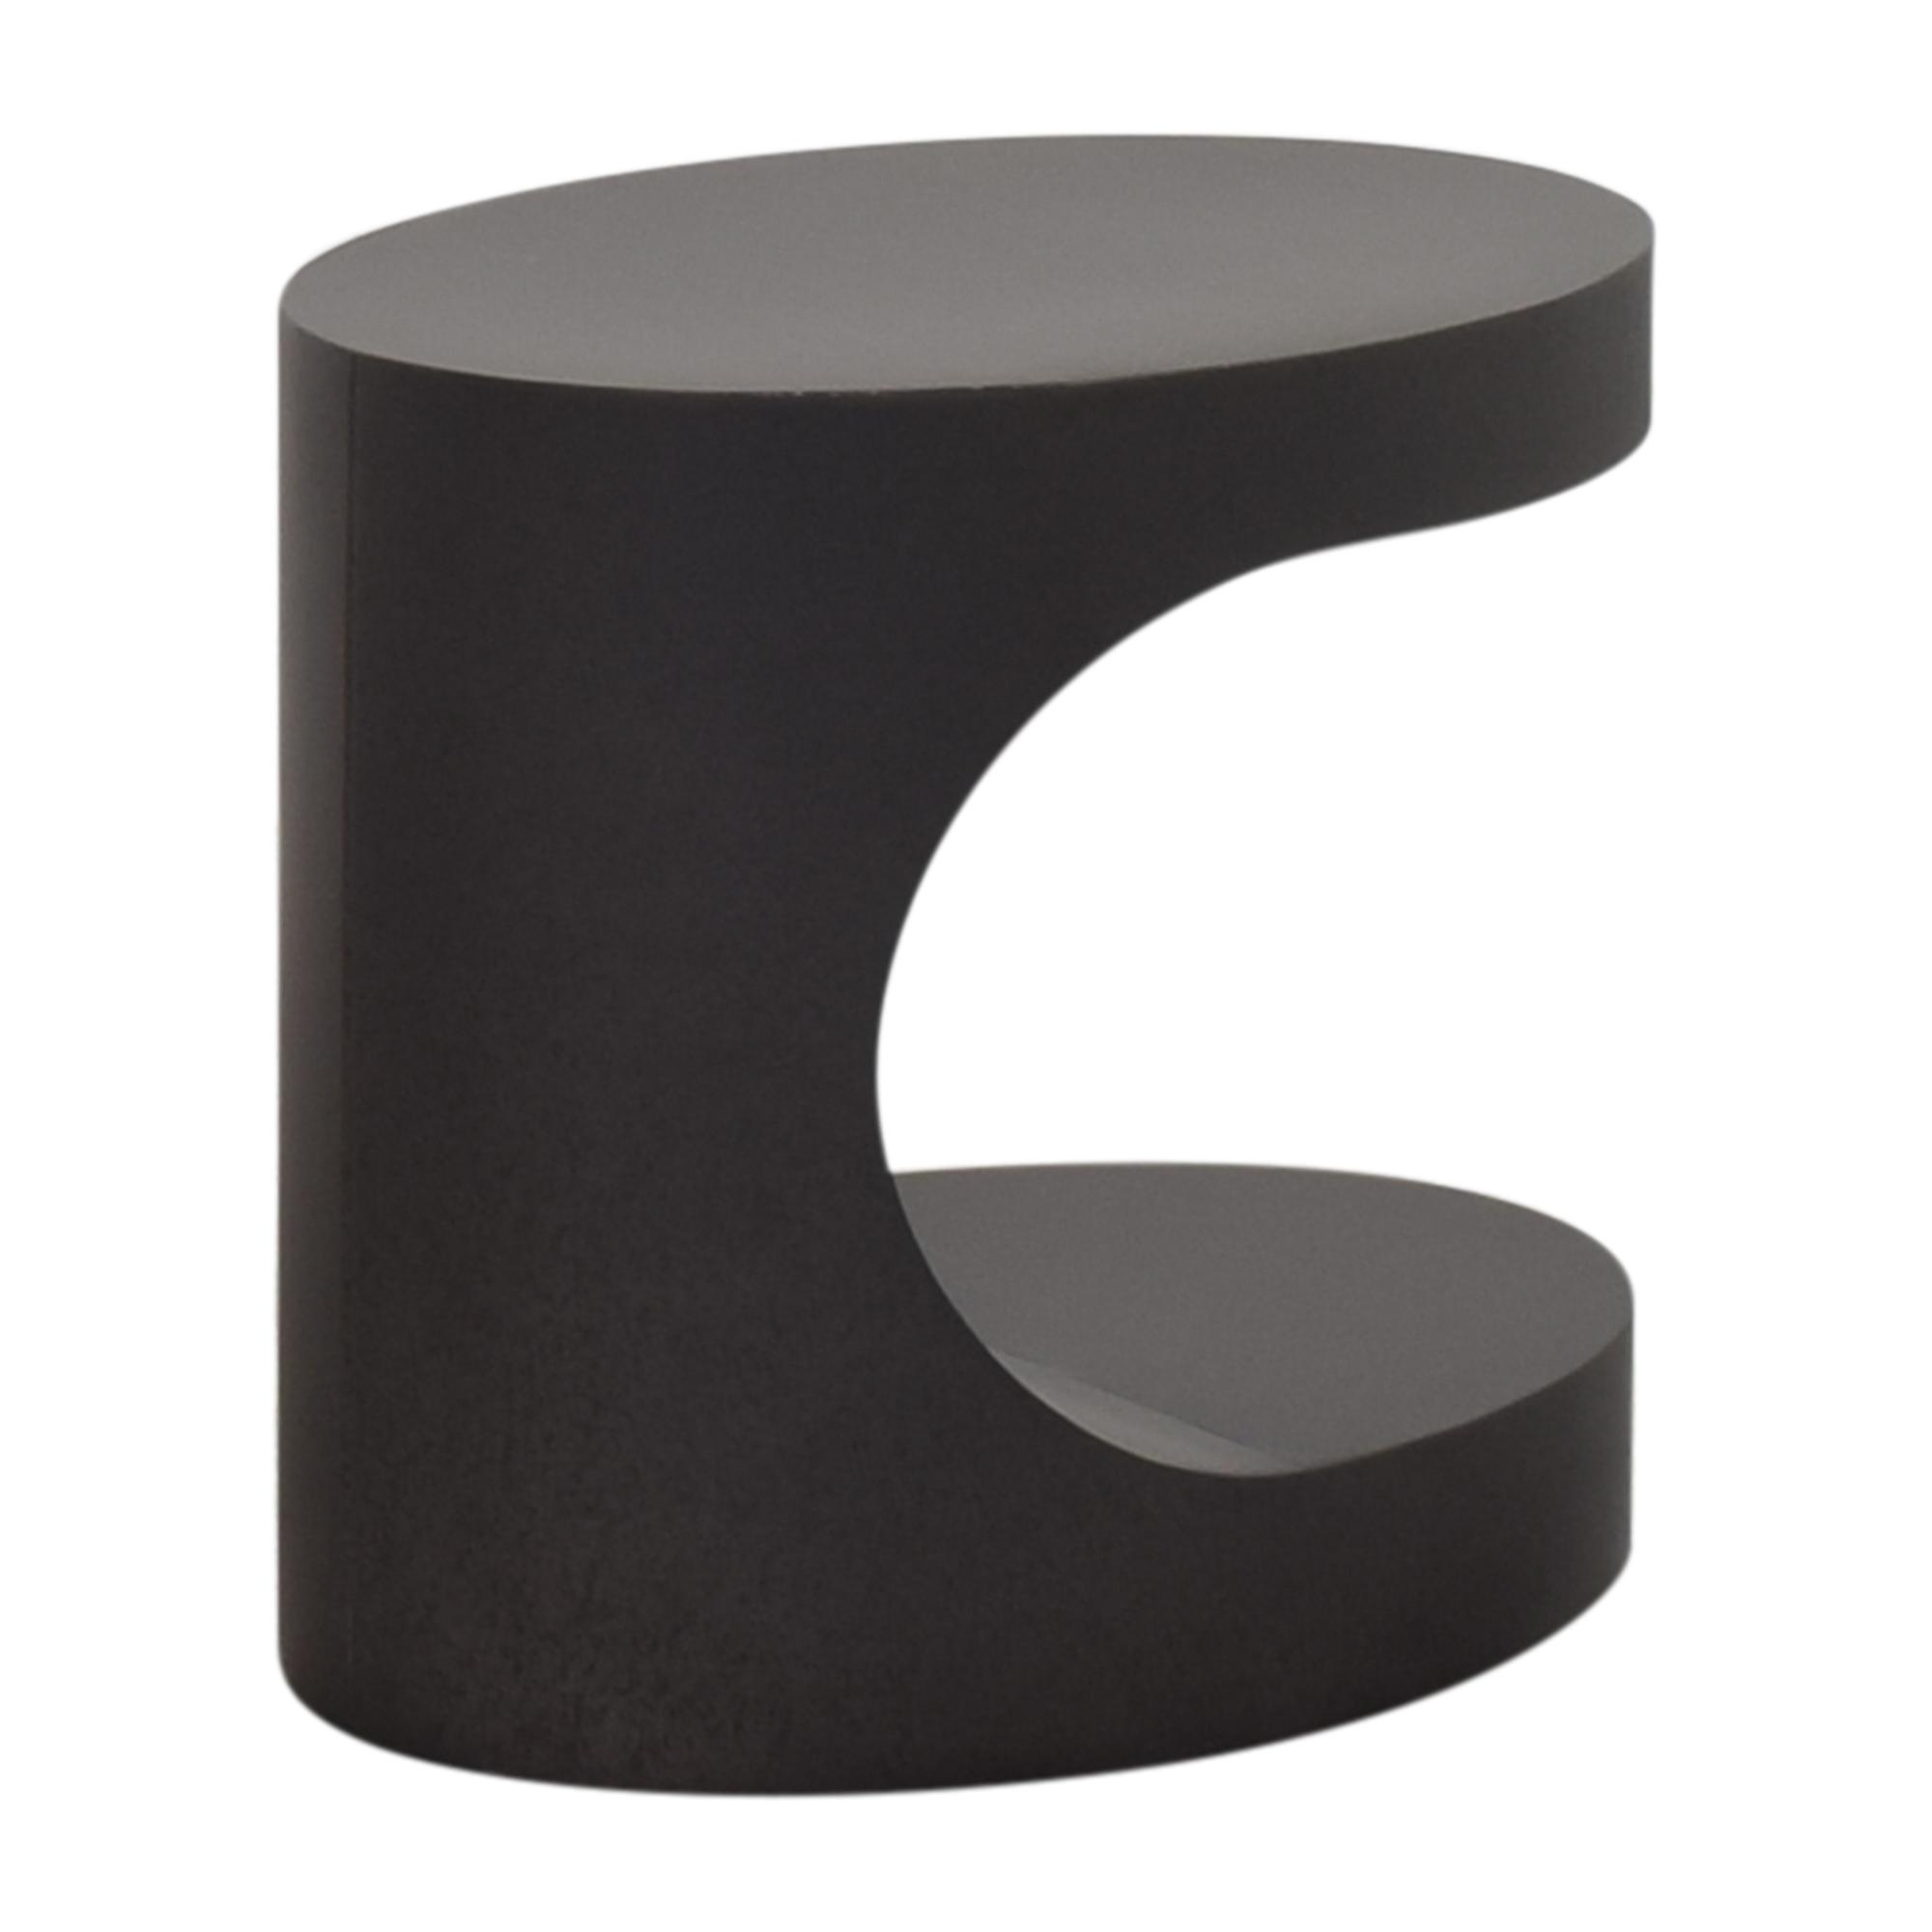 buy Room & Board Room & Board Ellipse C-Table online